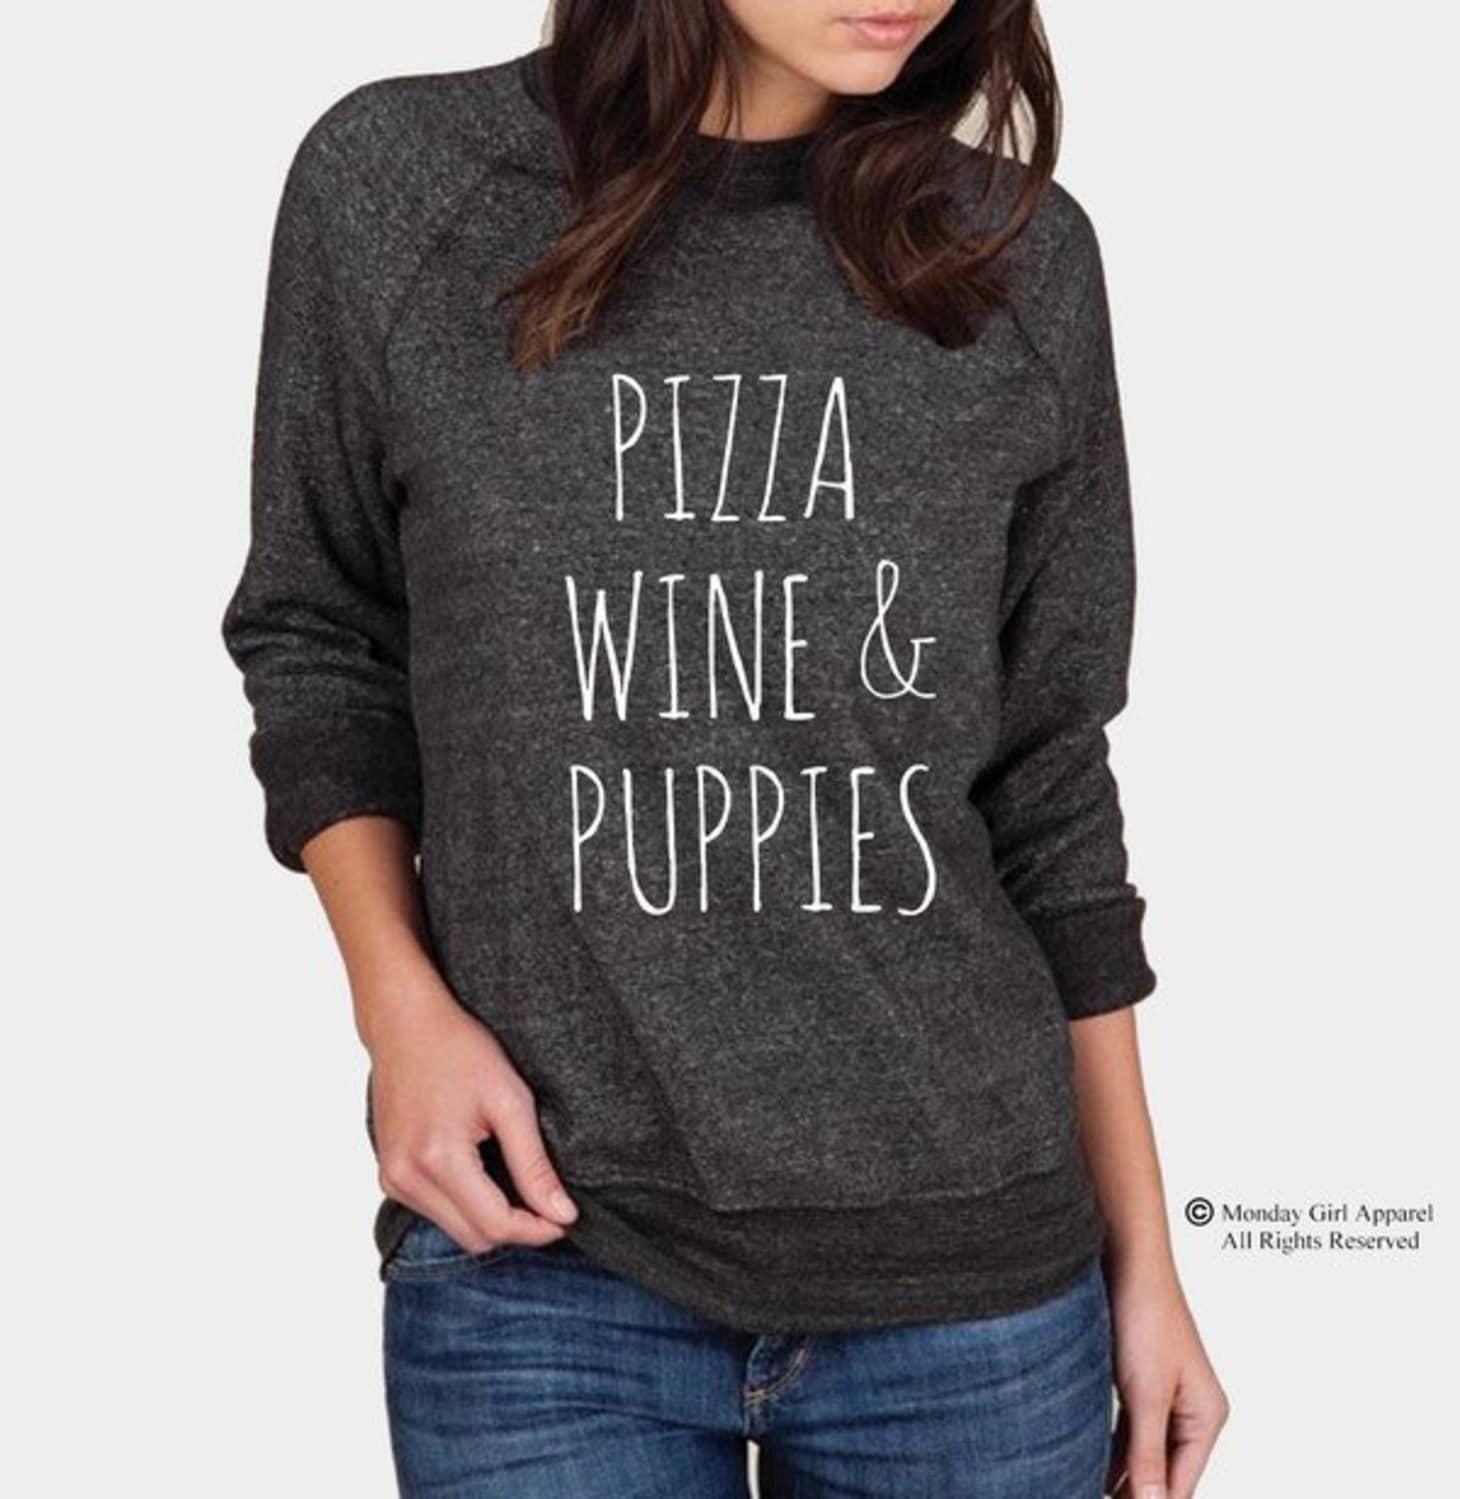 f3a967861 Pizza Wine and Puppies Champ Sweatshirt, $34 (Image credit:  MondayGirlApparel)